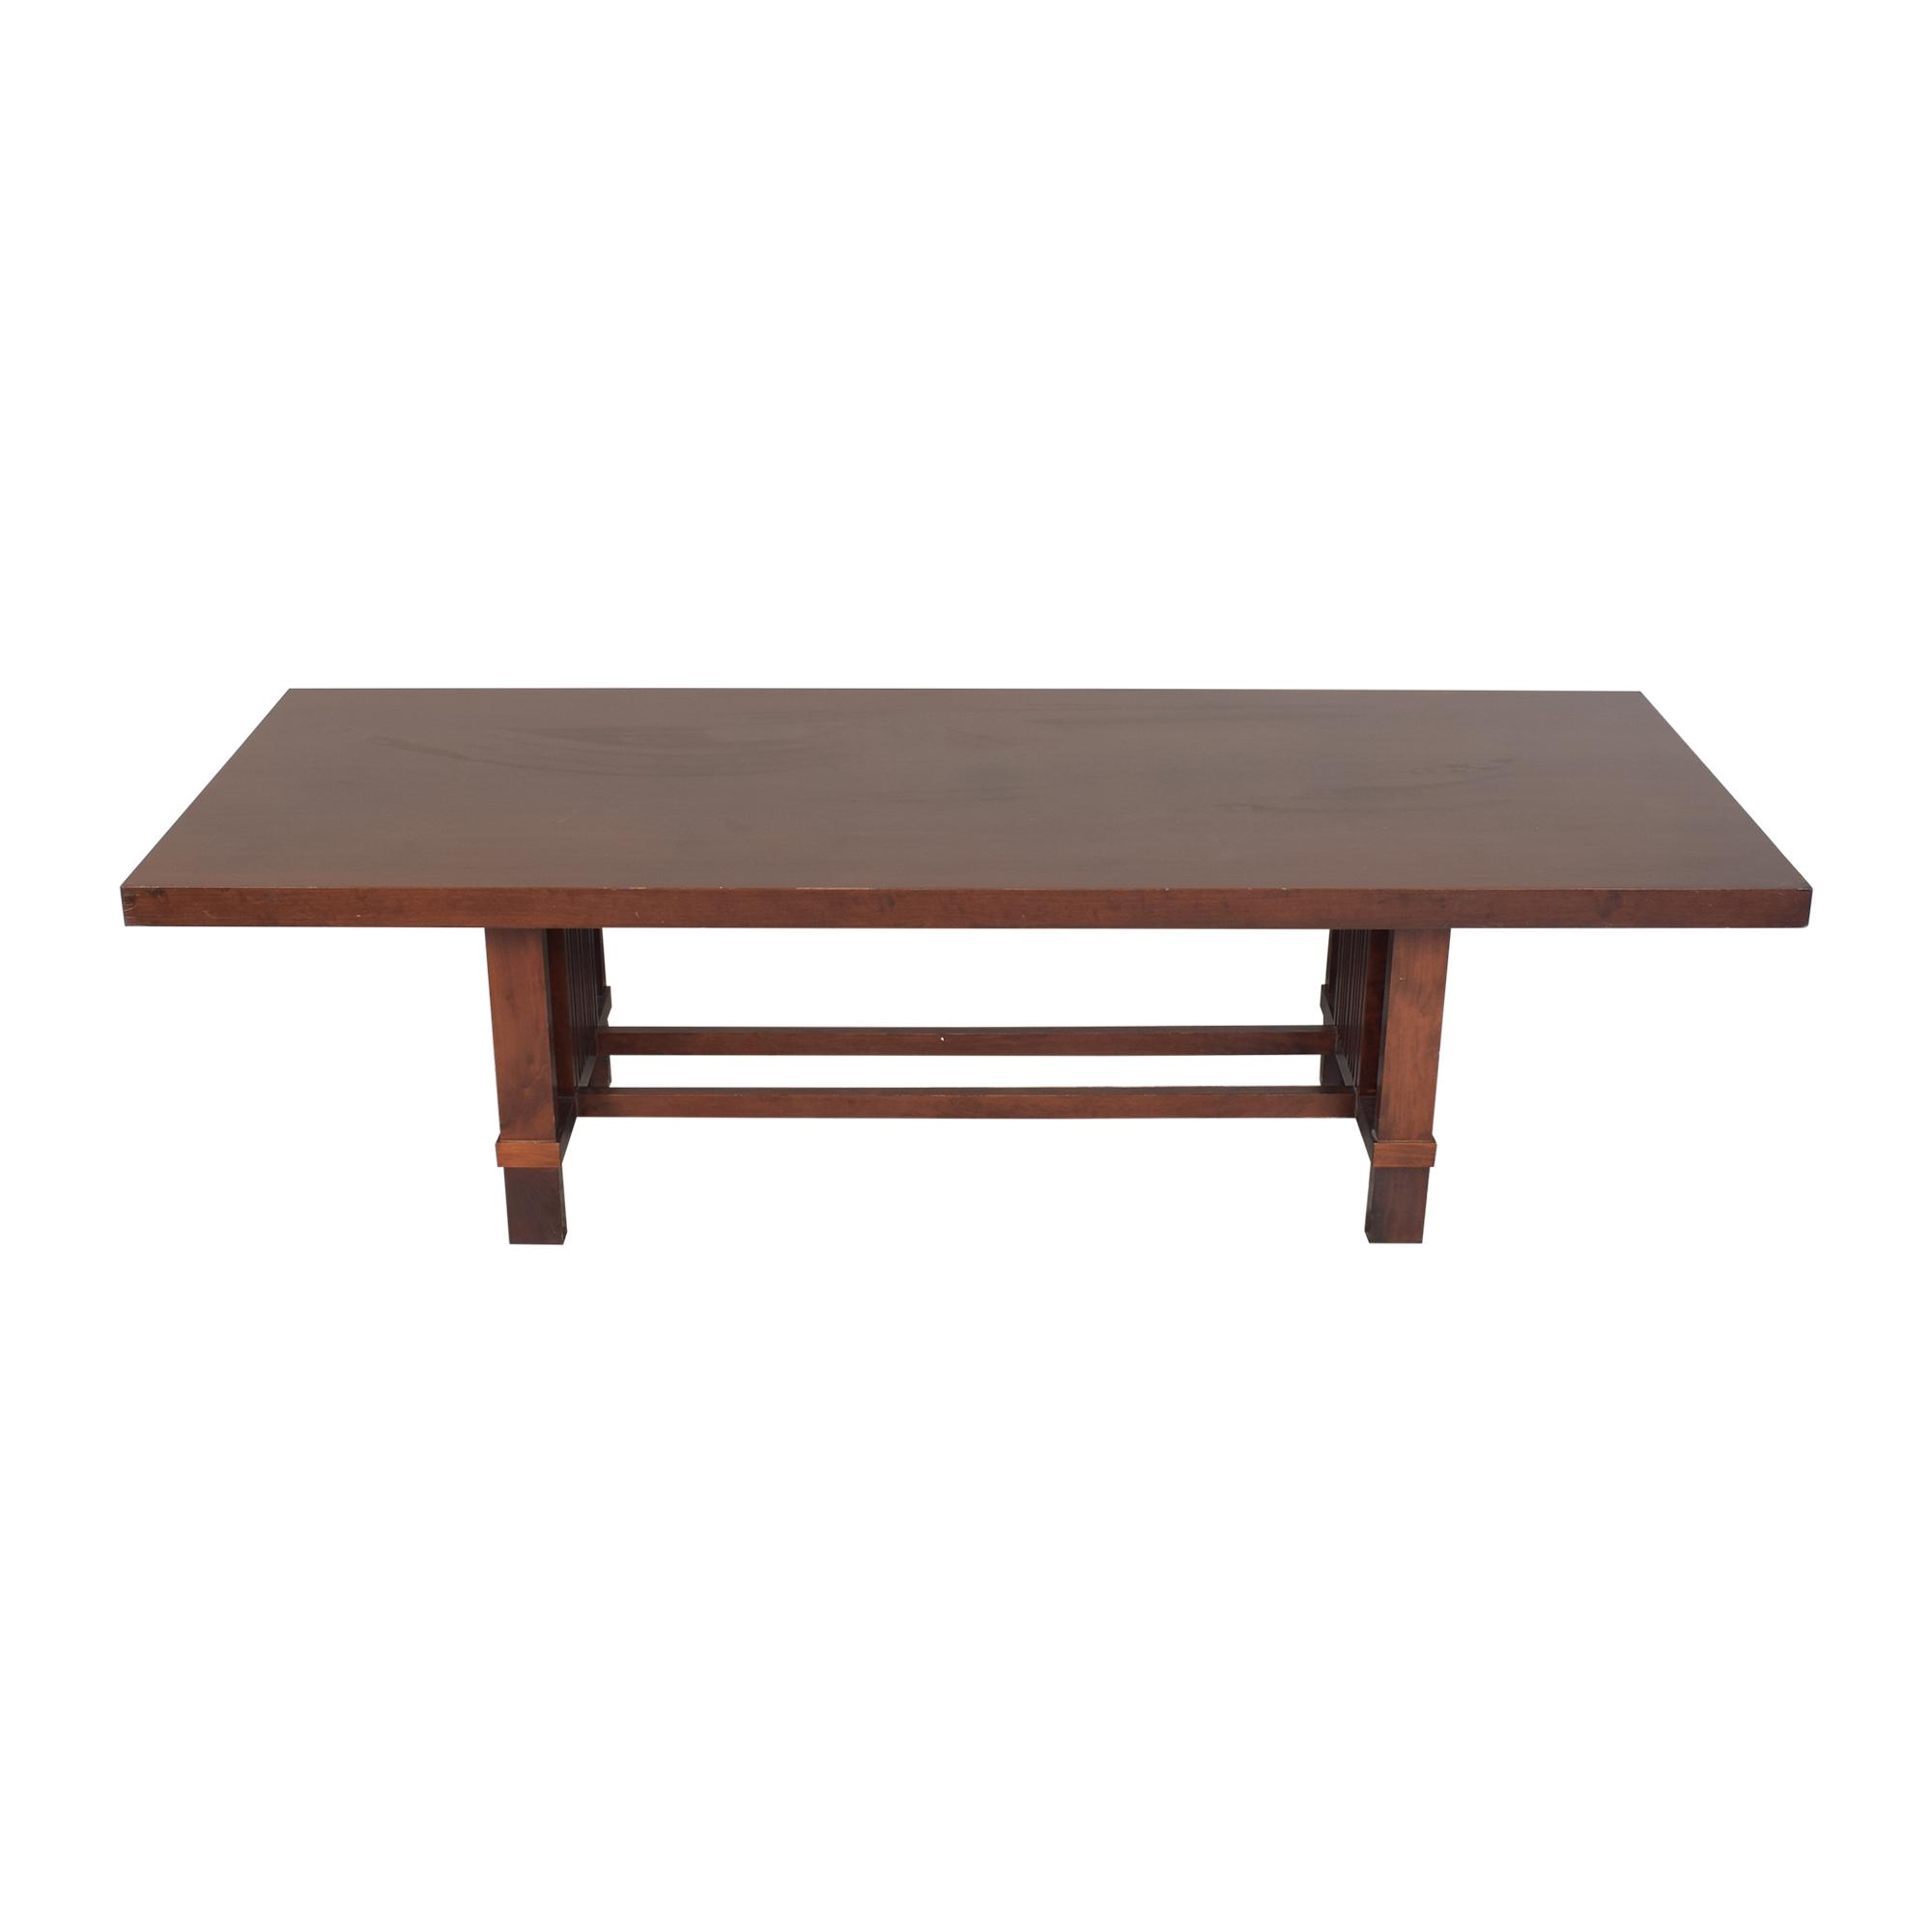 Cassina Frank Lloyd Wright Taliesin Dining Table sale